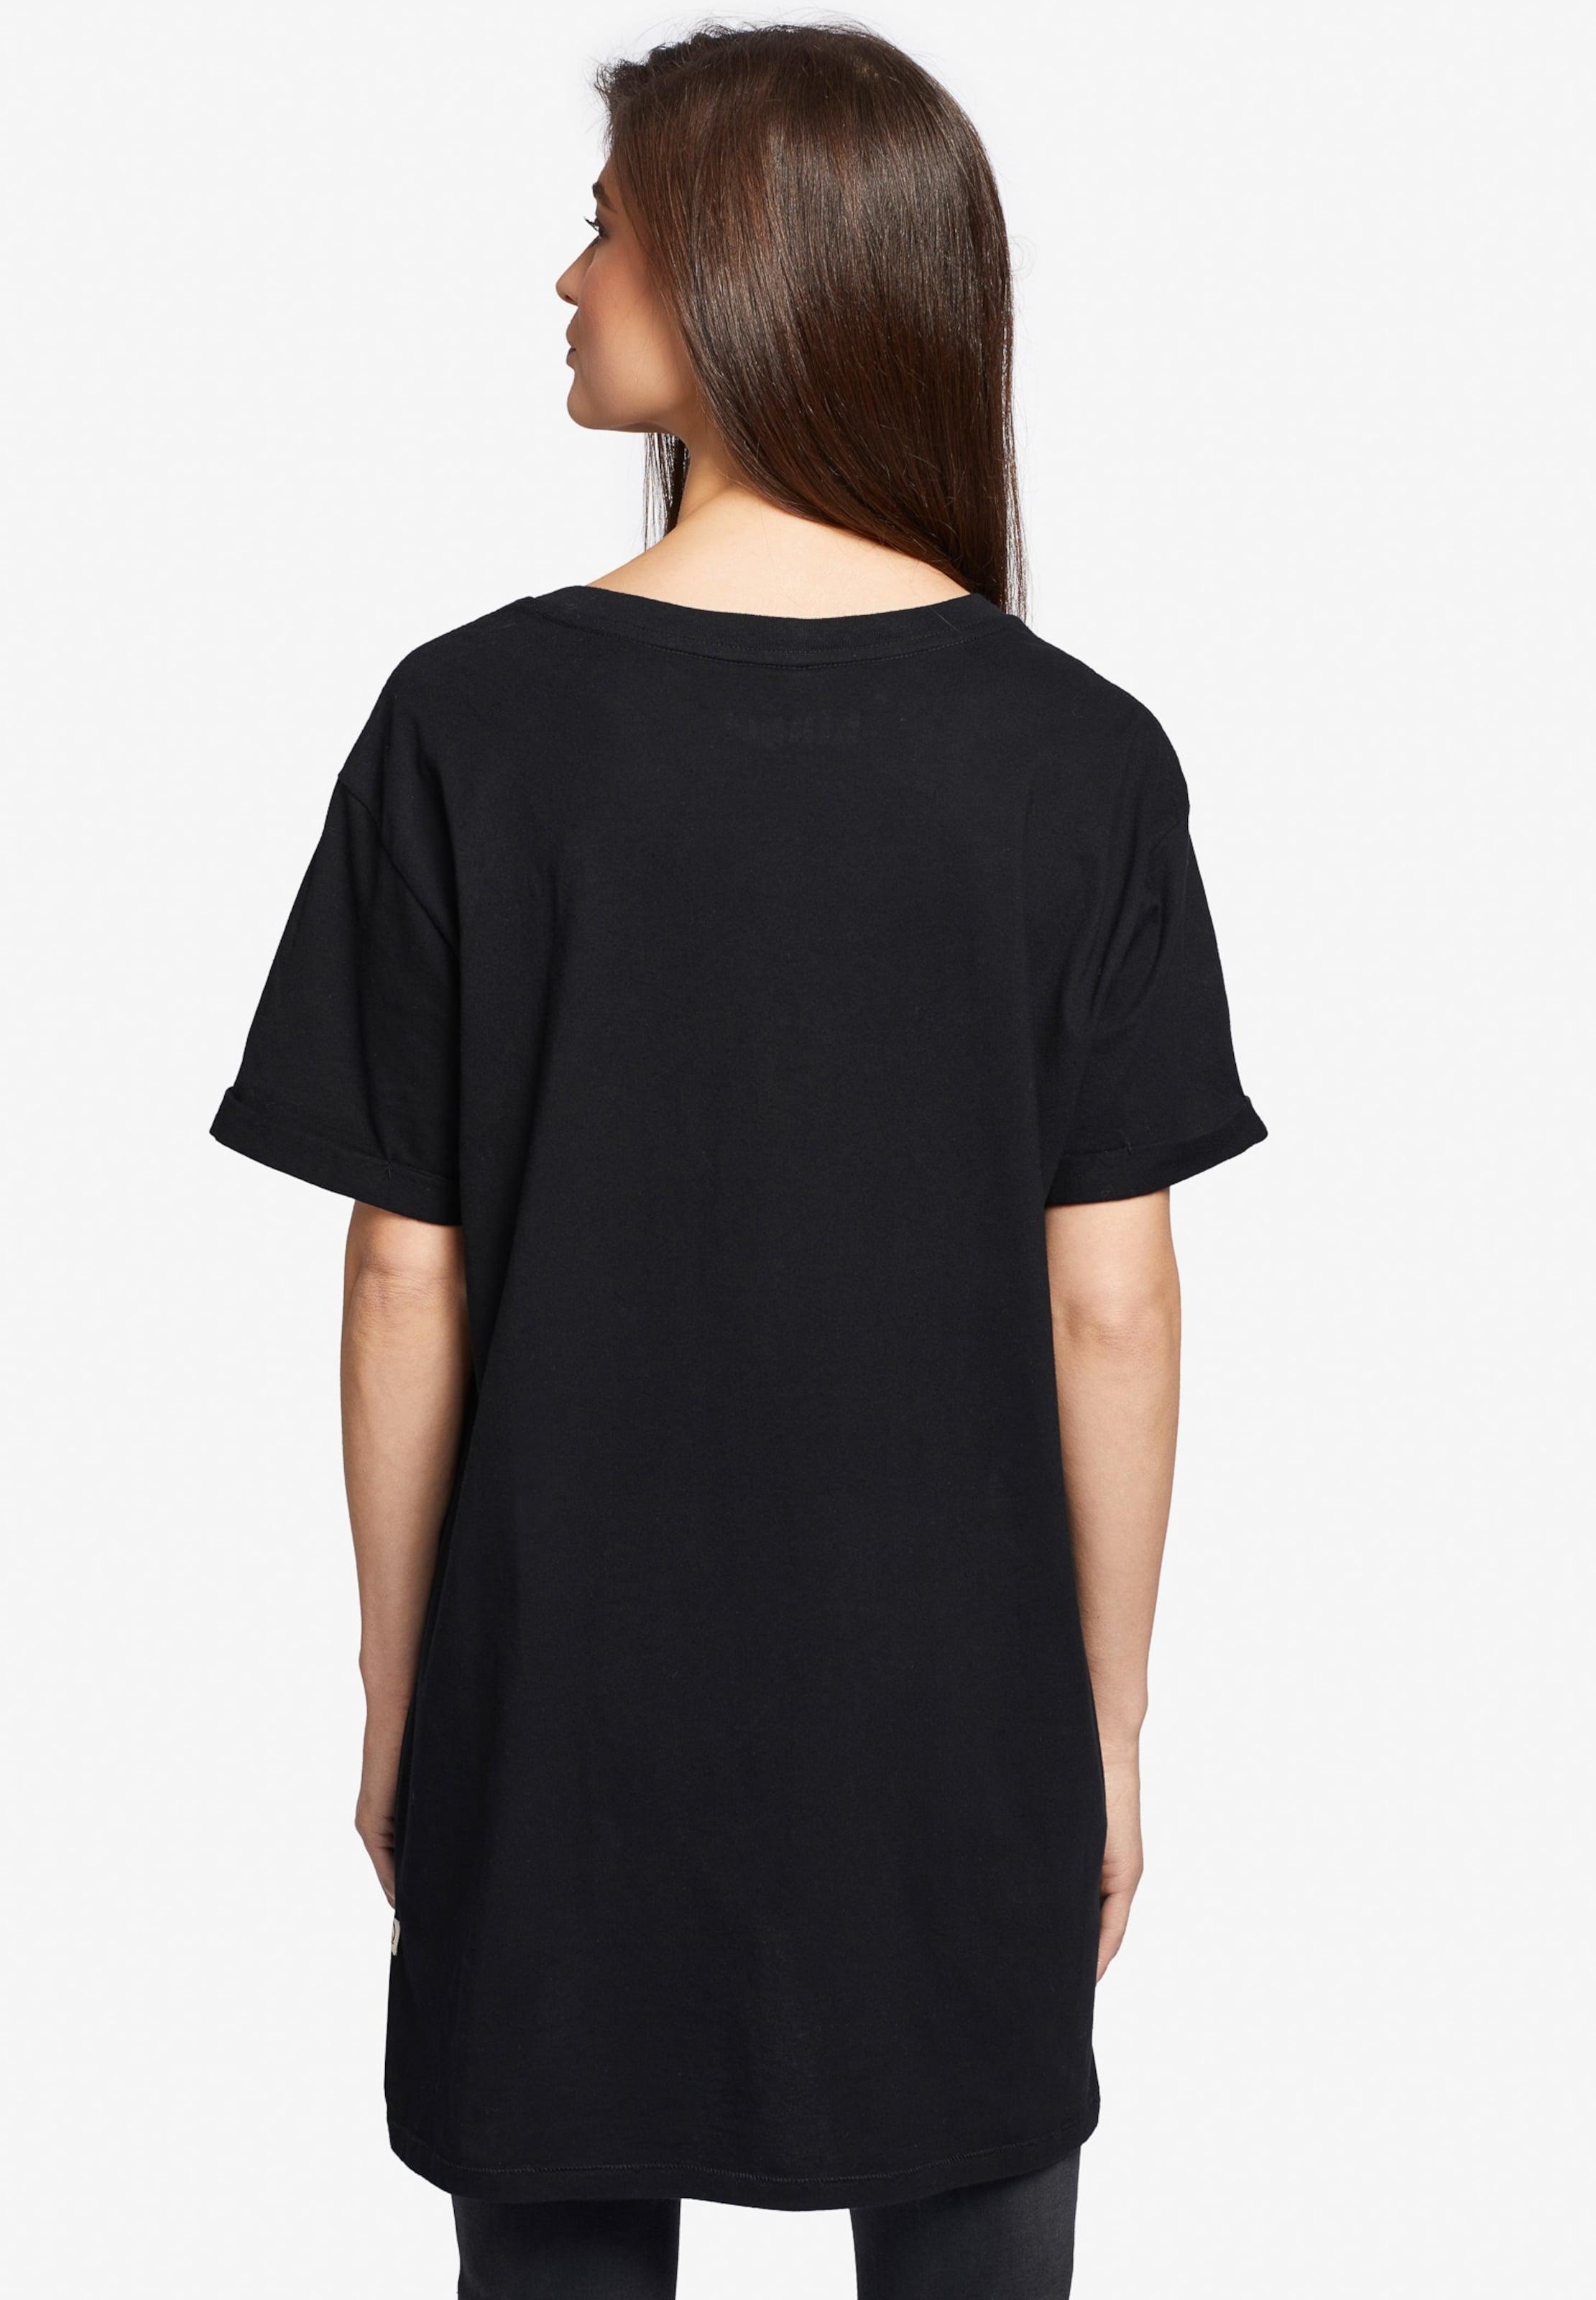 ' Madness' Shirt Zwart Khujo 80's In Anne 354ARLj